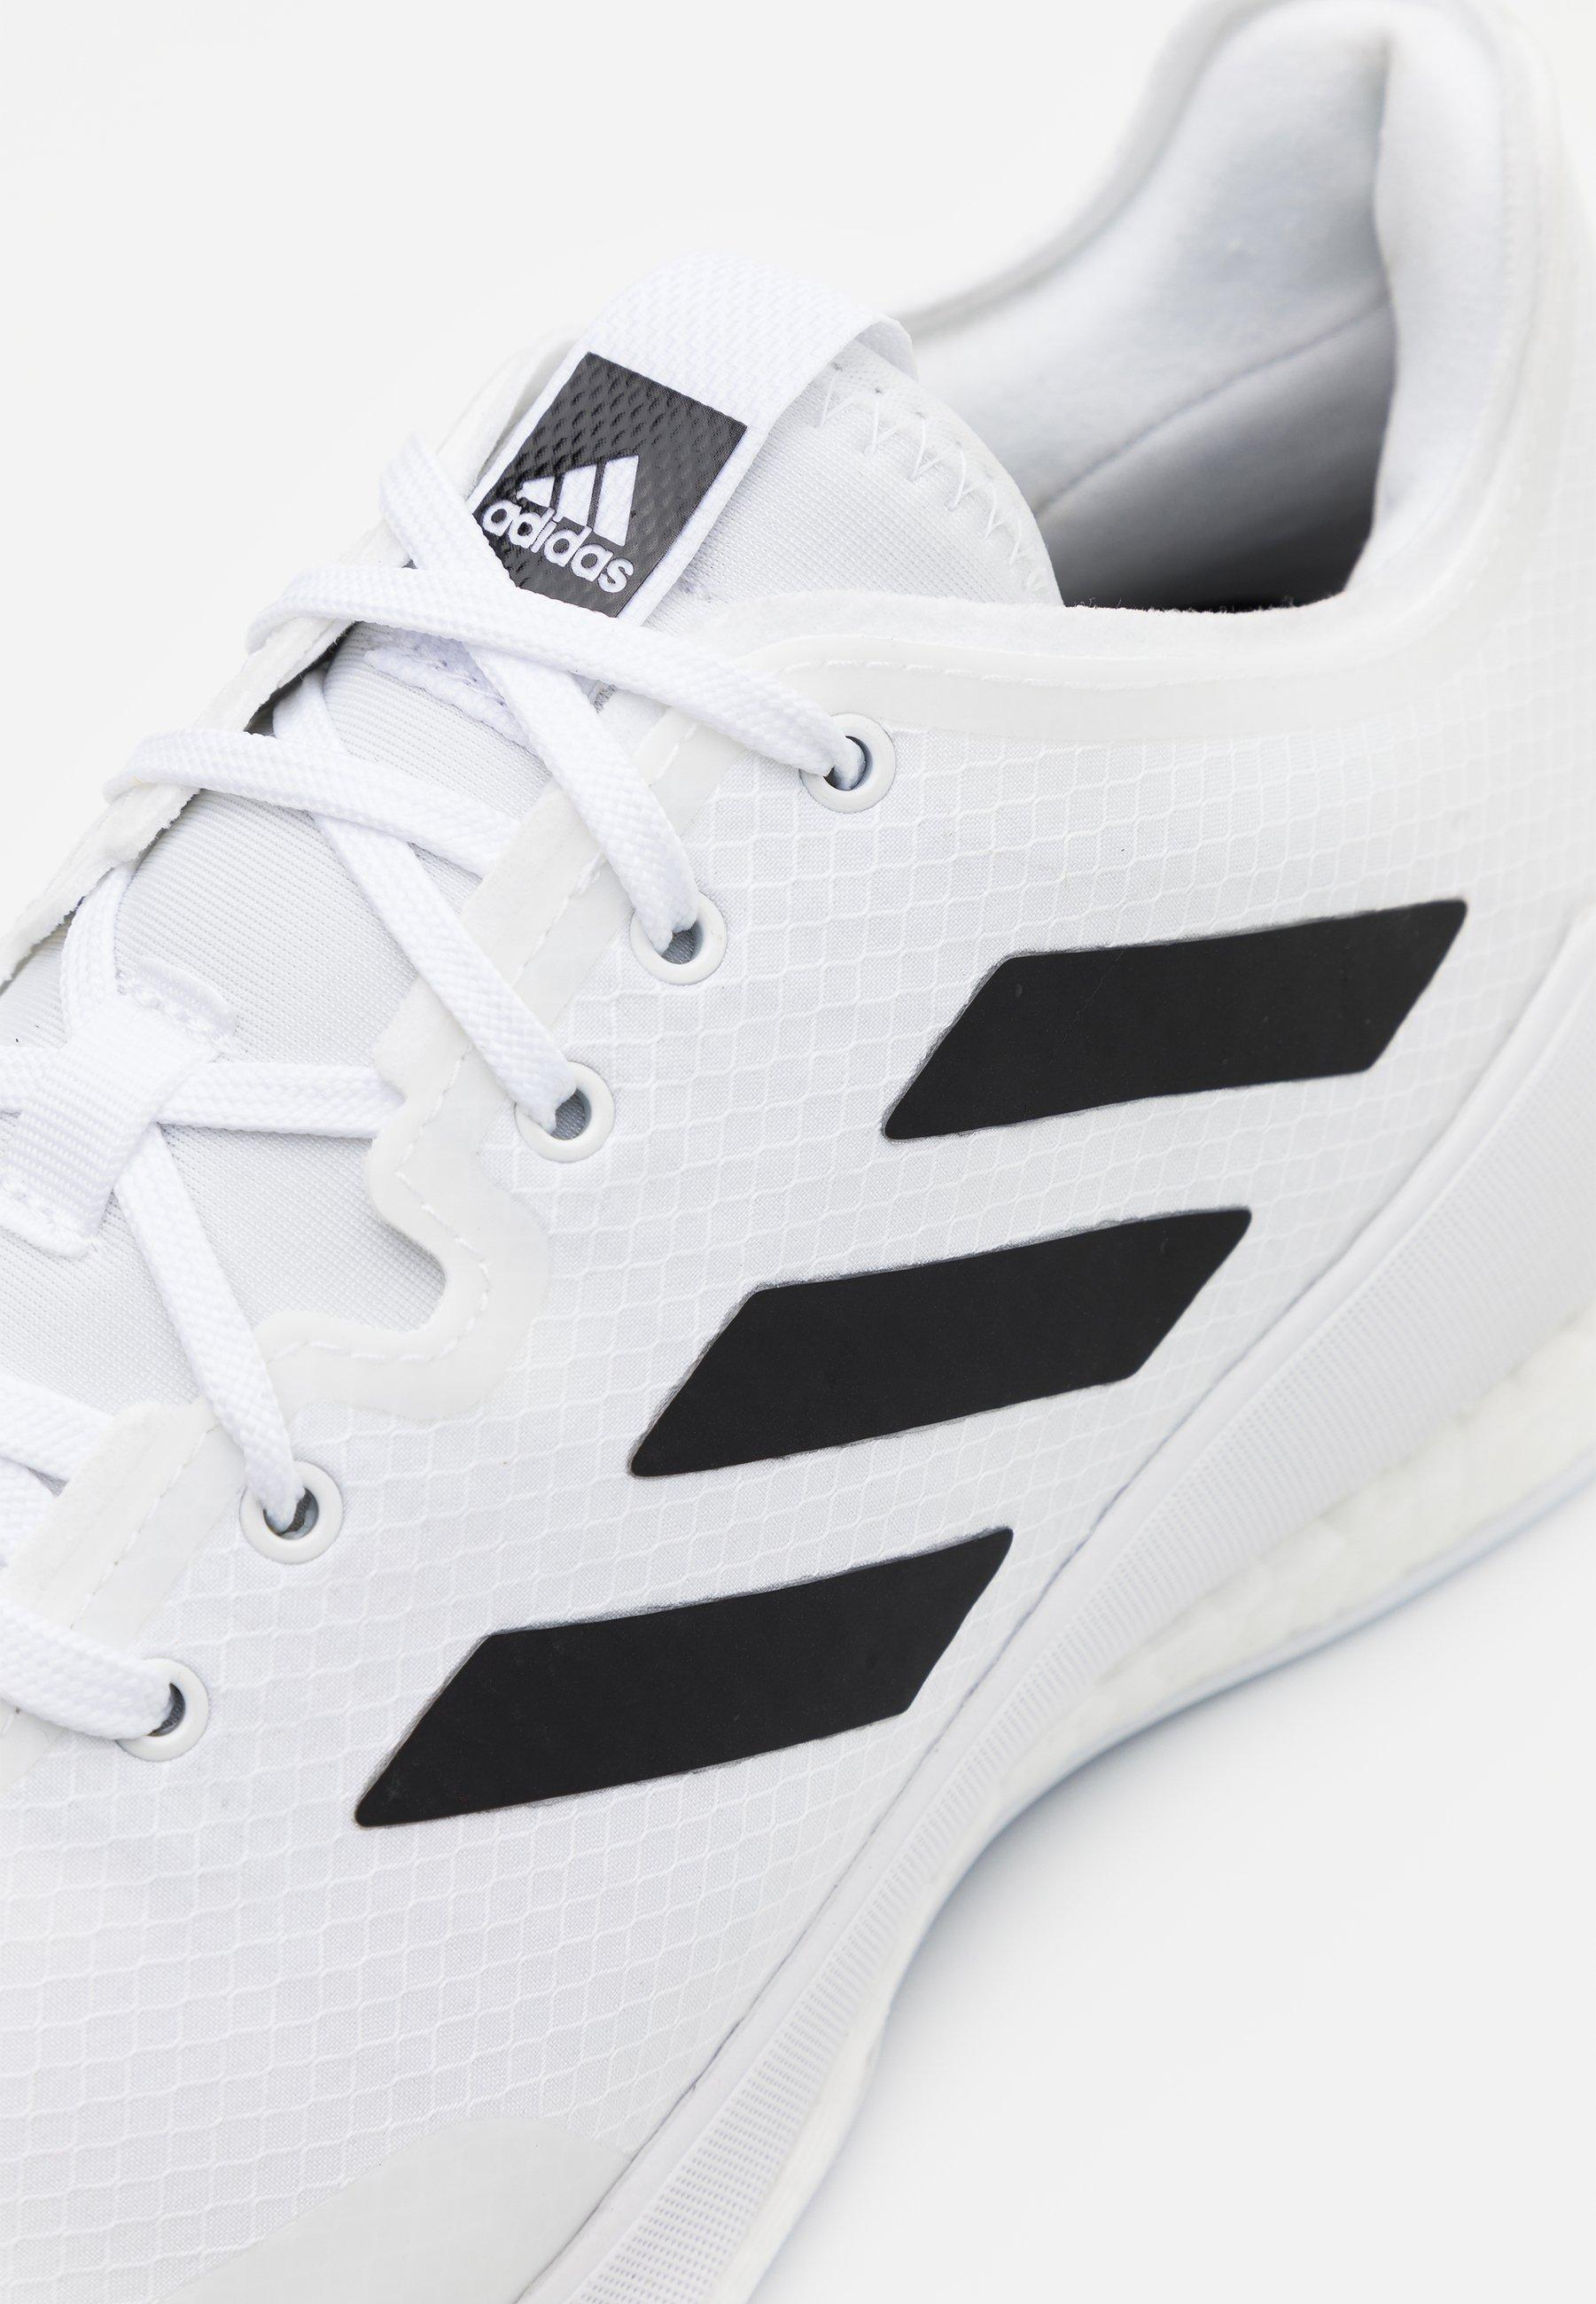 CRAZY FLIGHT BOOST INDOOR SPORTS SHOES Volleyballschuh footwear whitecore black